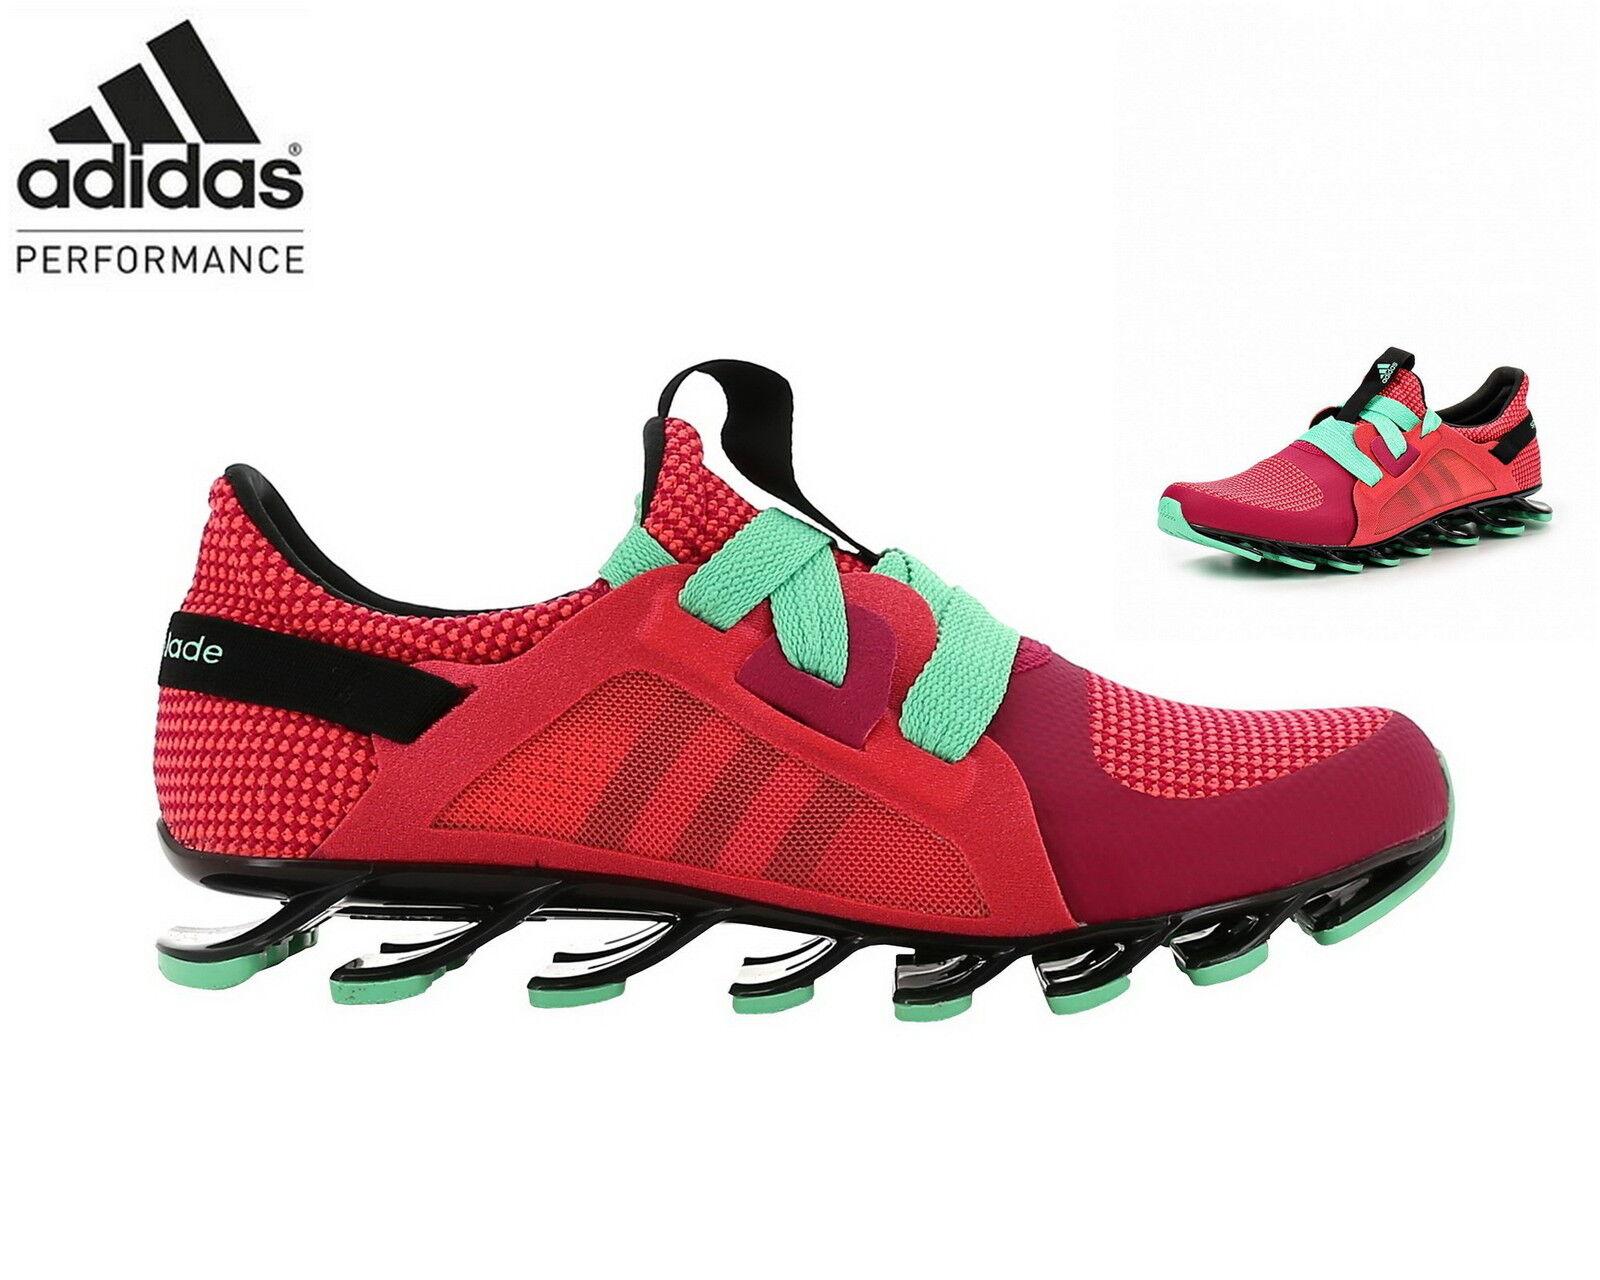 adidas Springblade Nanaya Damen Laufschuhe Training Sneaker AQ5247 bold ROT/blac